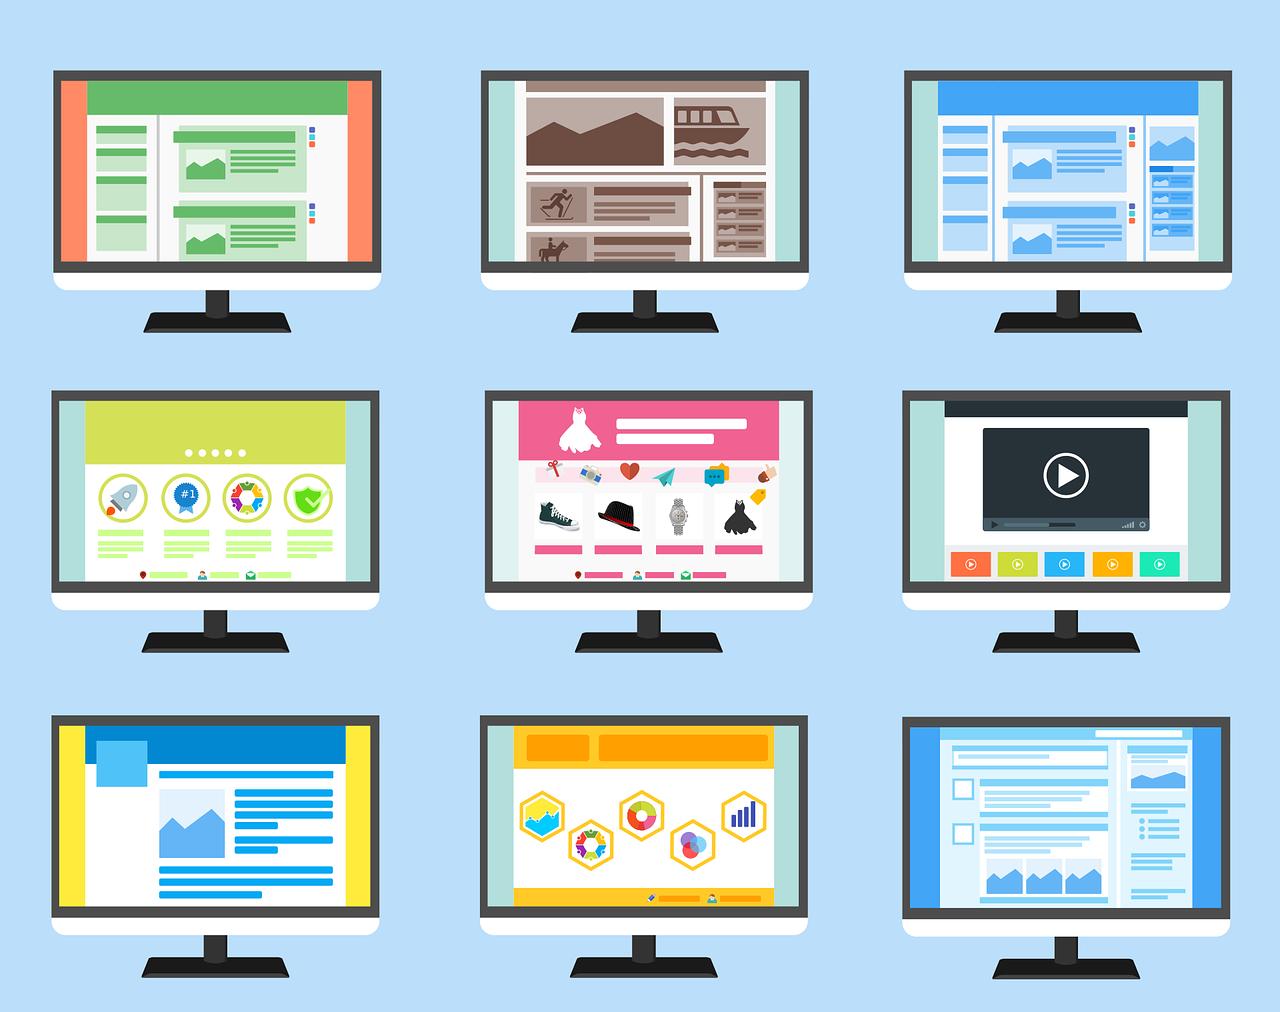 12 Langkah Cara Membuat Website Sederhana Menggunakan HTML